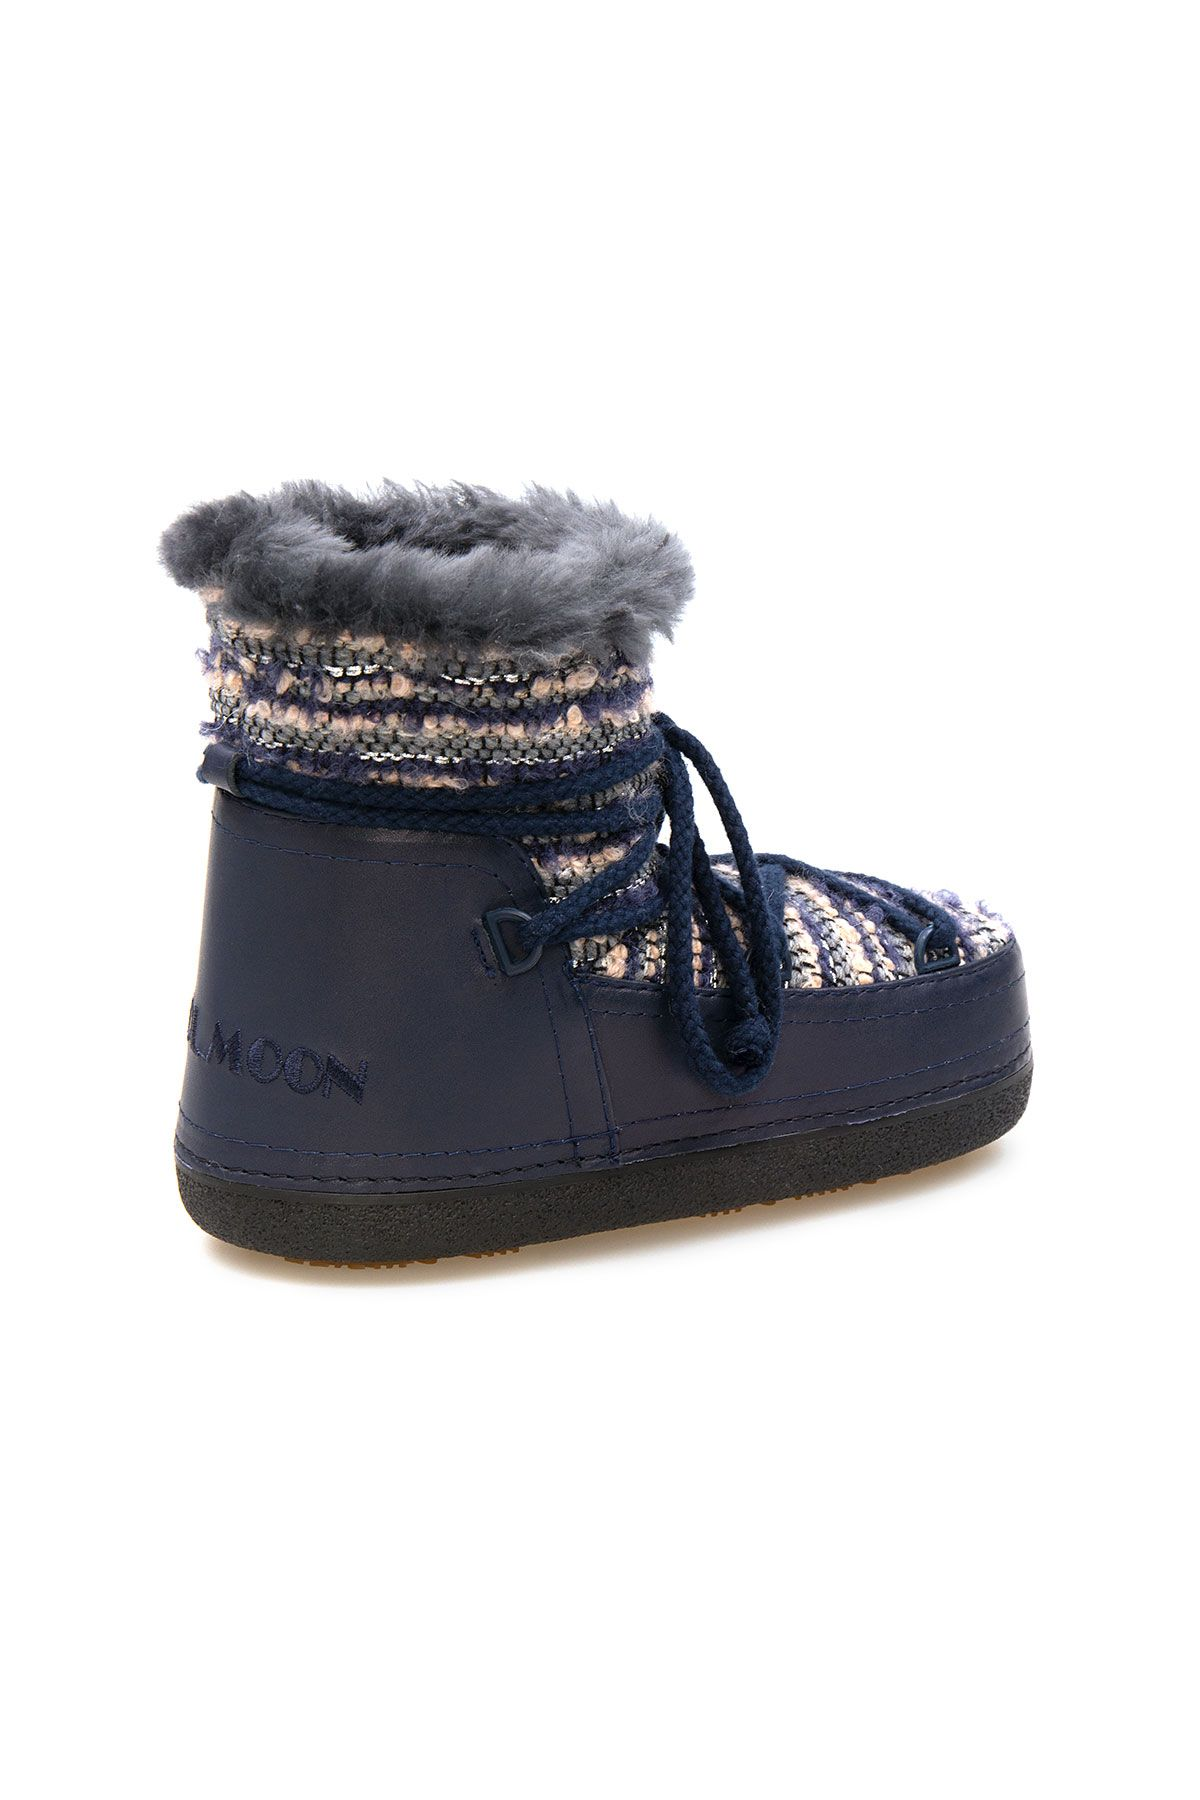 Cool Moon Genuine Sheepskin Lined Women's Snow Boots 251328 Navy blue